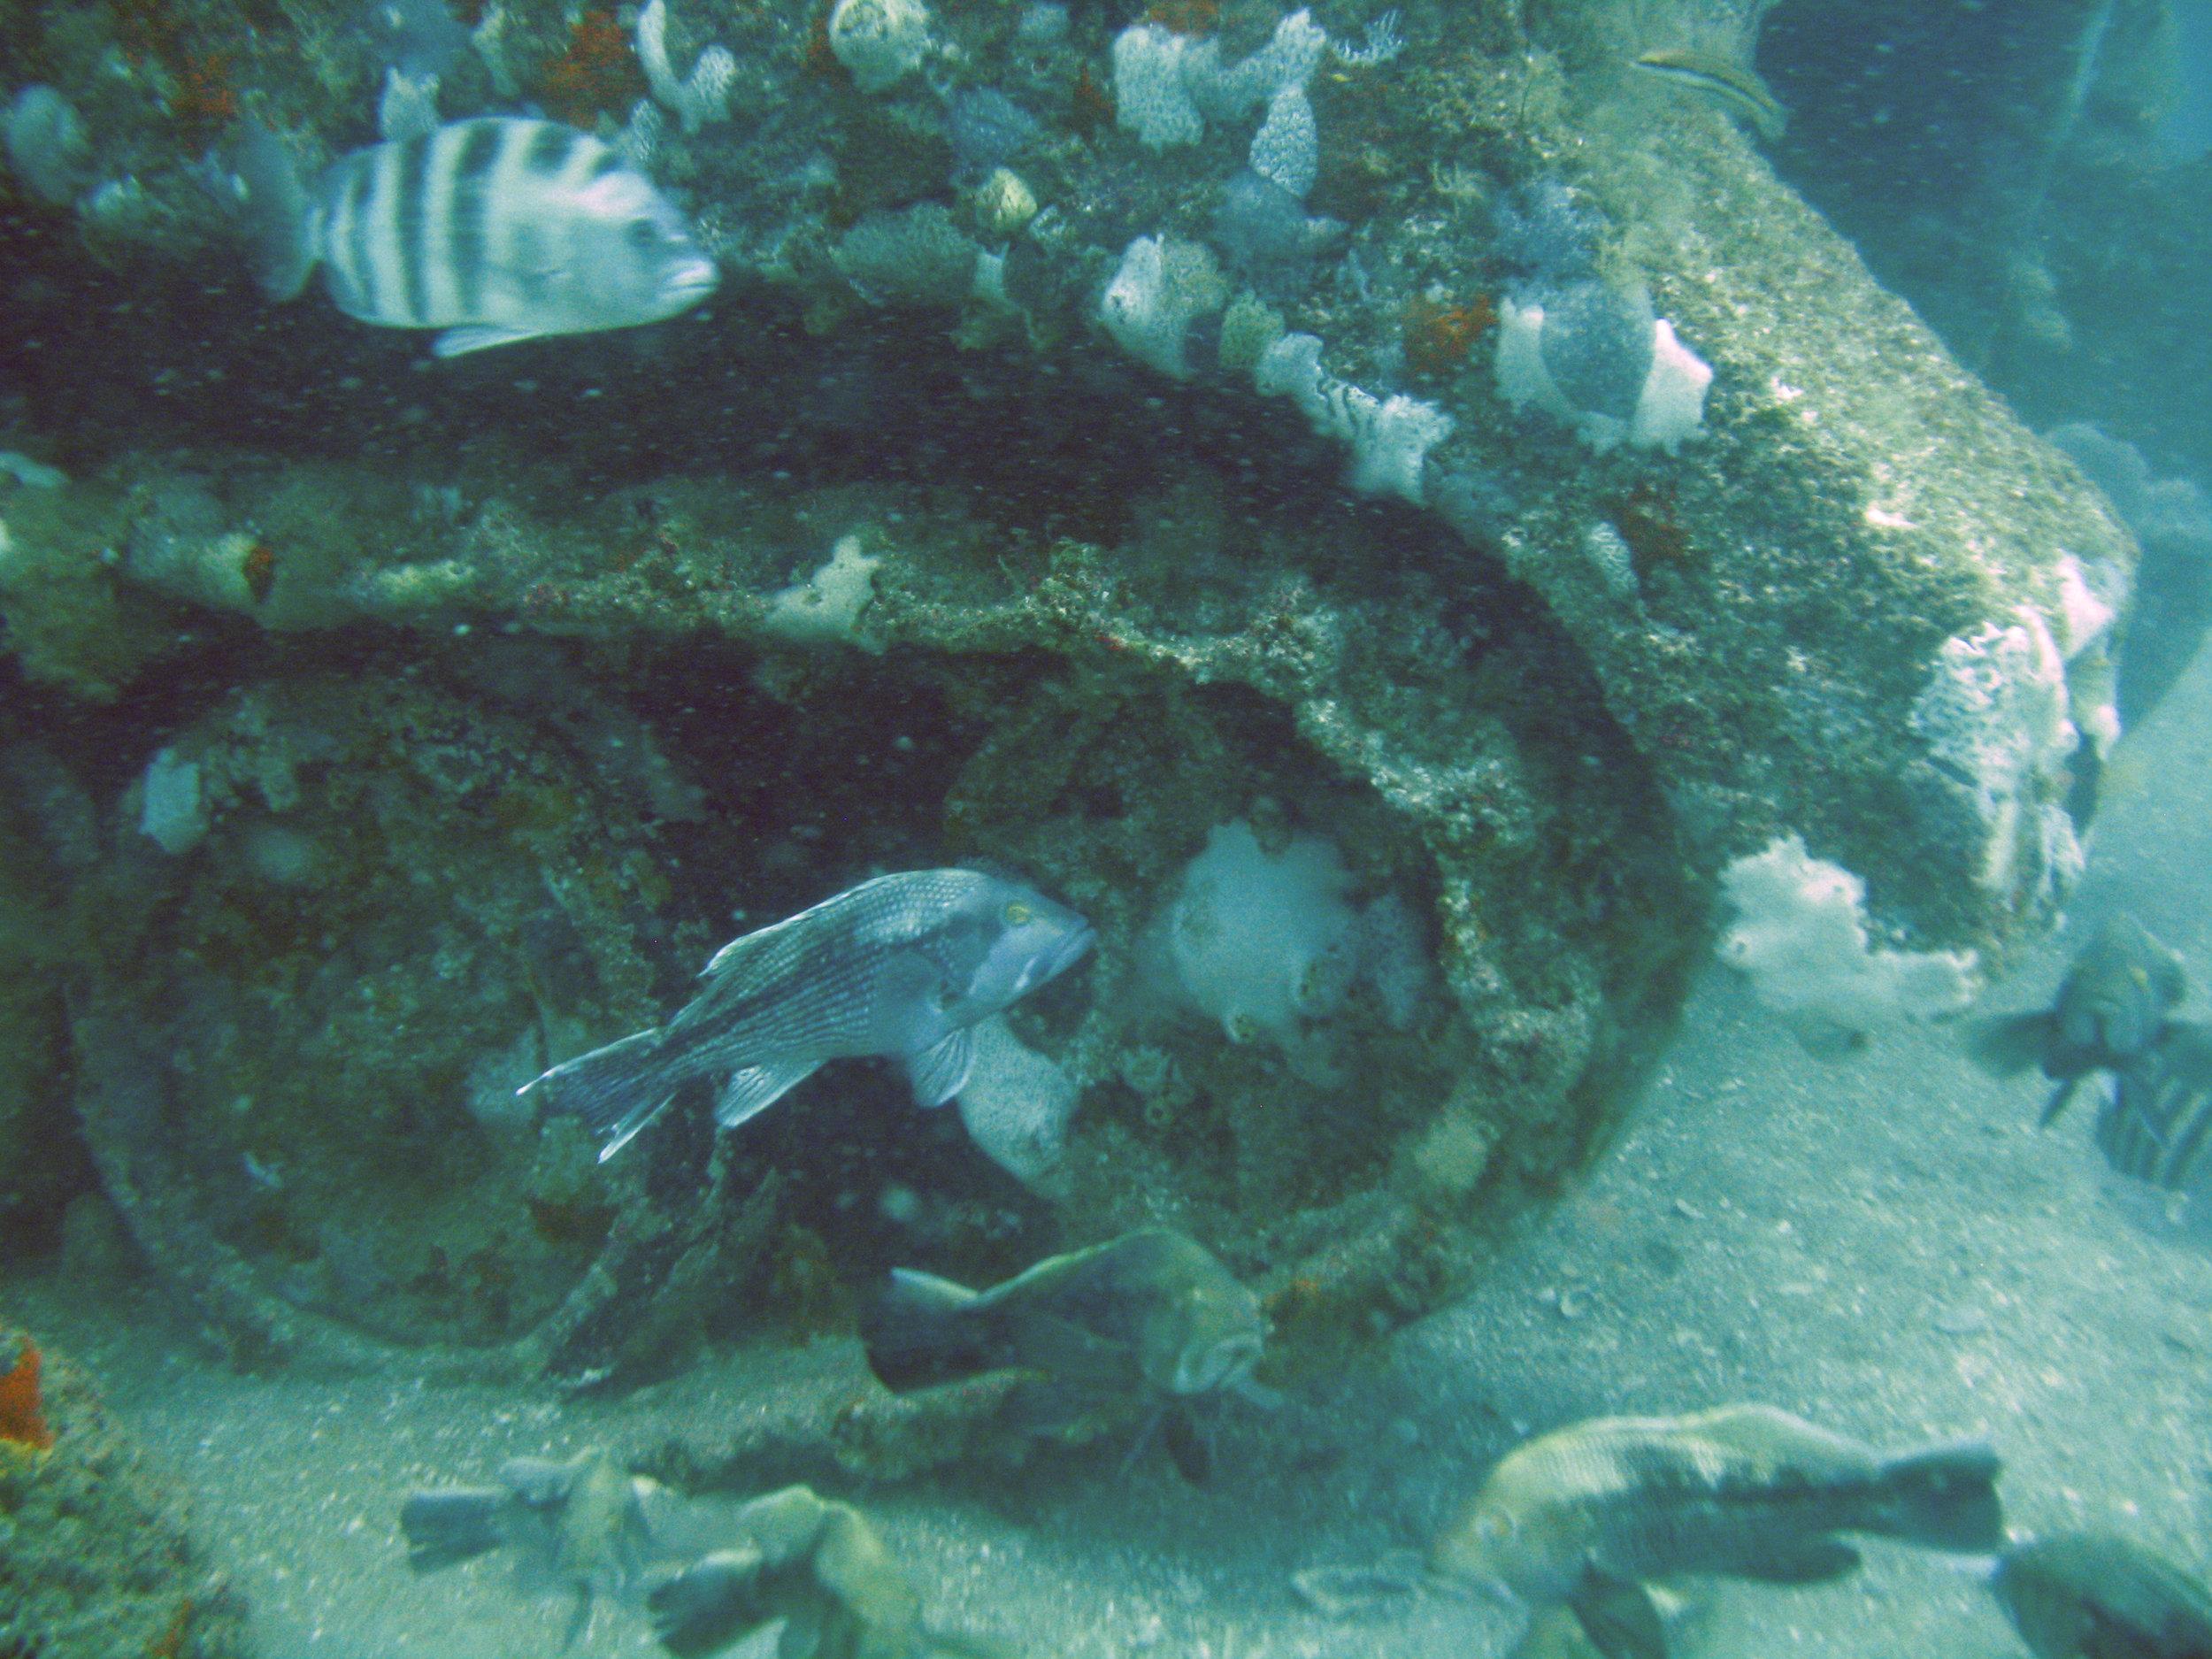 Black sea bass and sheepshead swim near the wheels of an armoured military vehicle repurposed as an artificial reef. (Photo: Bob Martore/SCDNR)